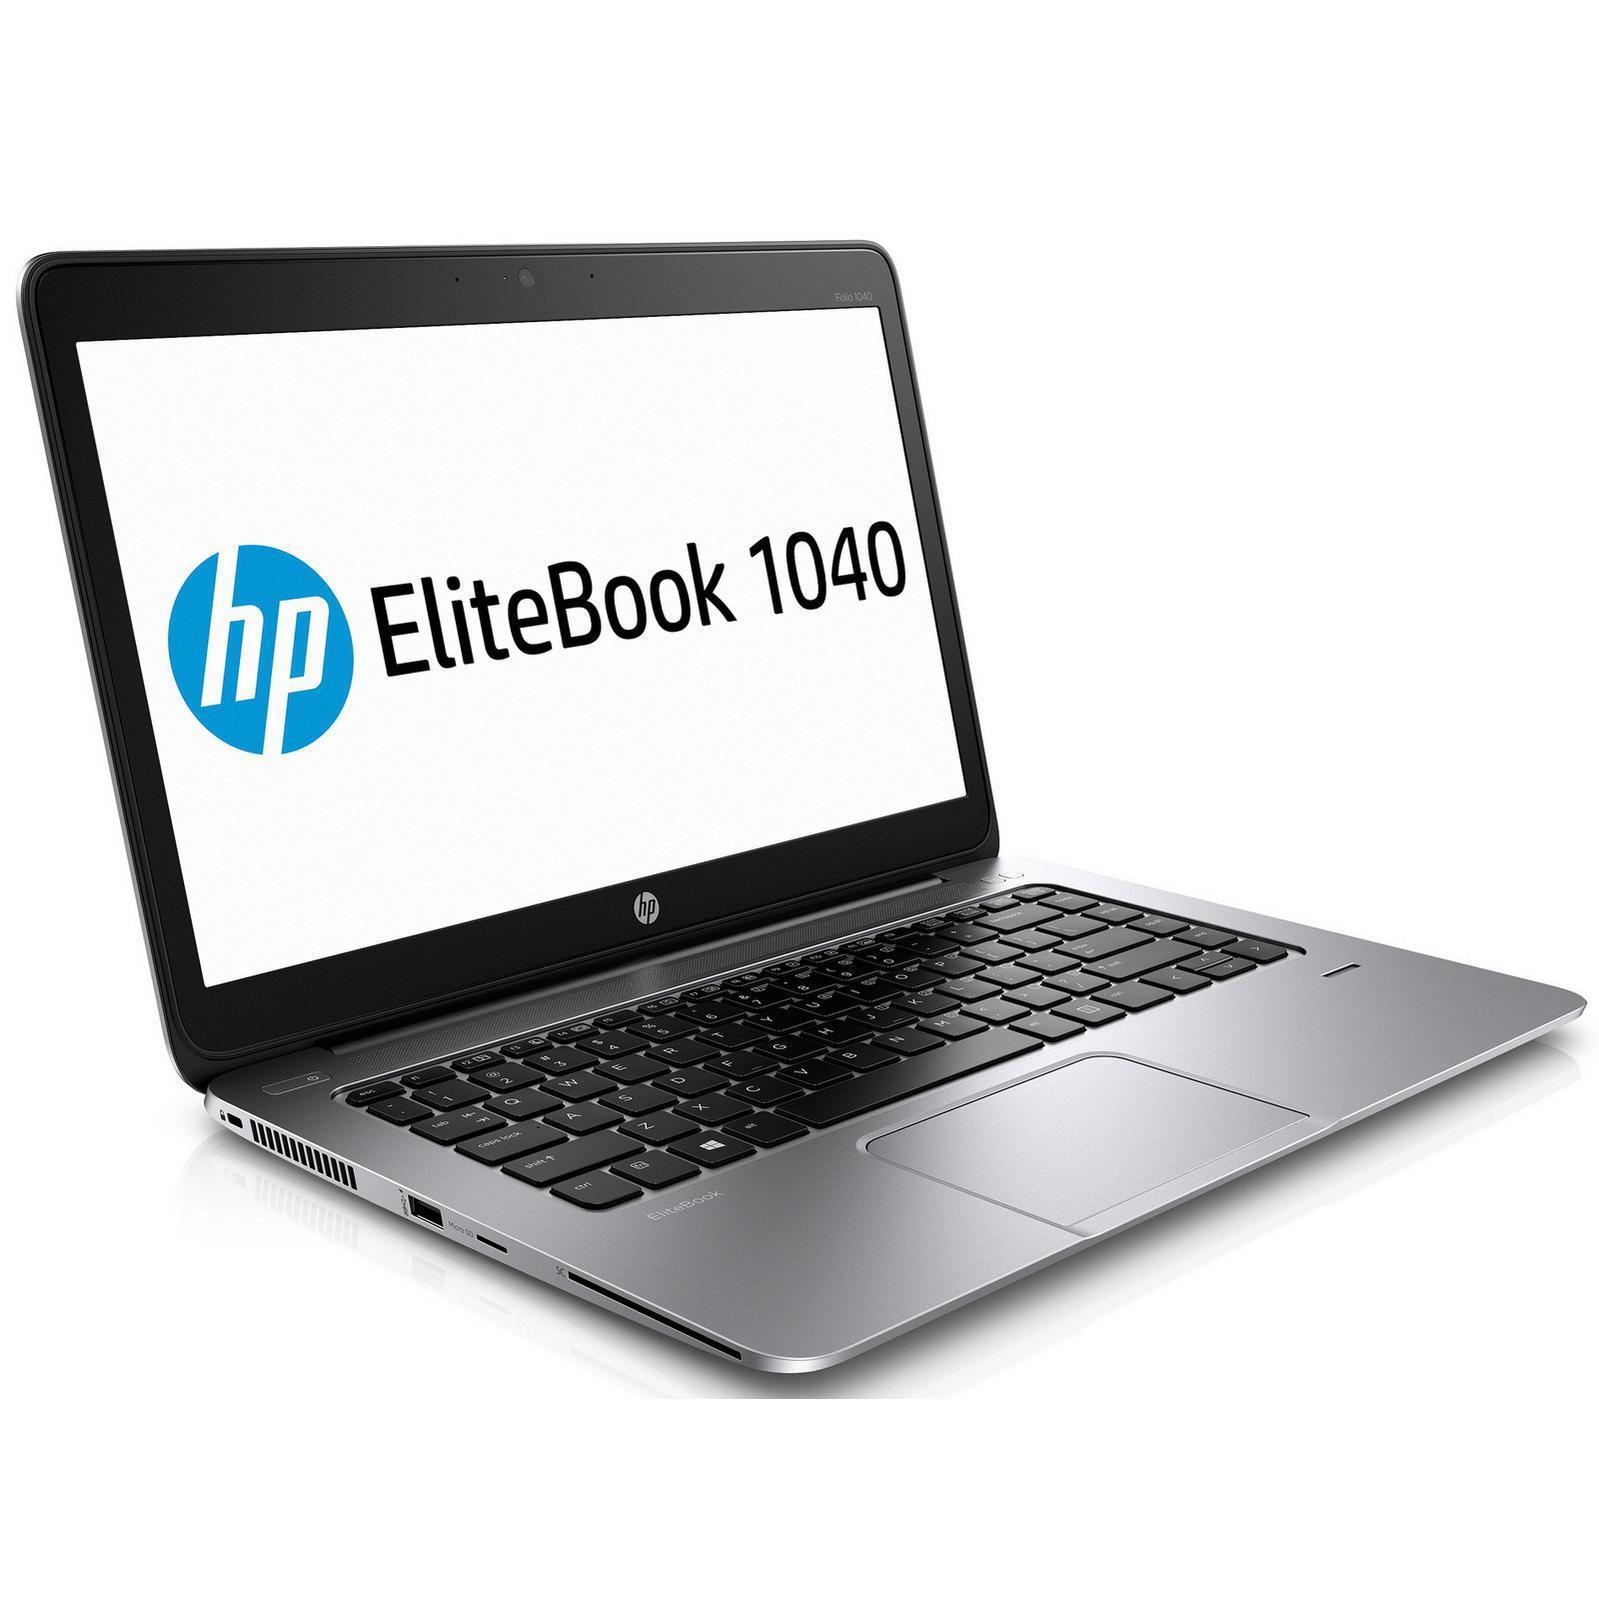 "OFERTÓN - Hp EliteBook Folio 1040 G2 14"" Core i7 2,6 GHz - SSD 256 GB (Reacondicionado)"